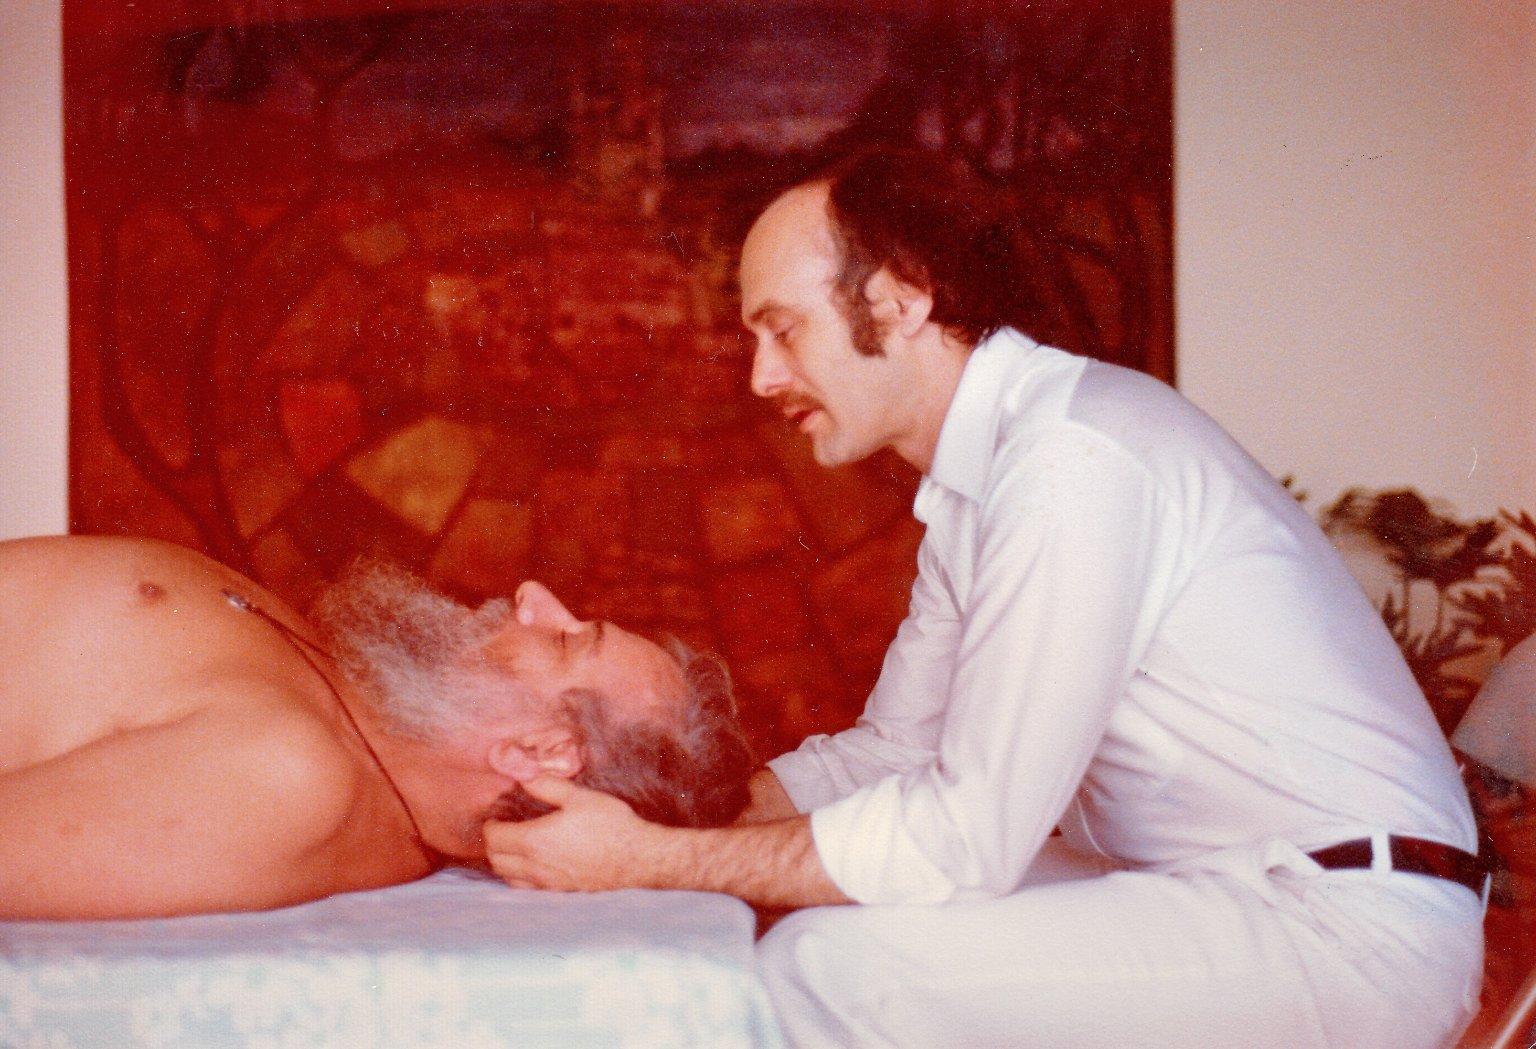 Rabbi Zalman Schachter doing bodywork with Joseph Heller, founder of Hellerwork, ca. 1979.